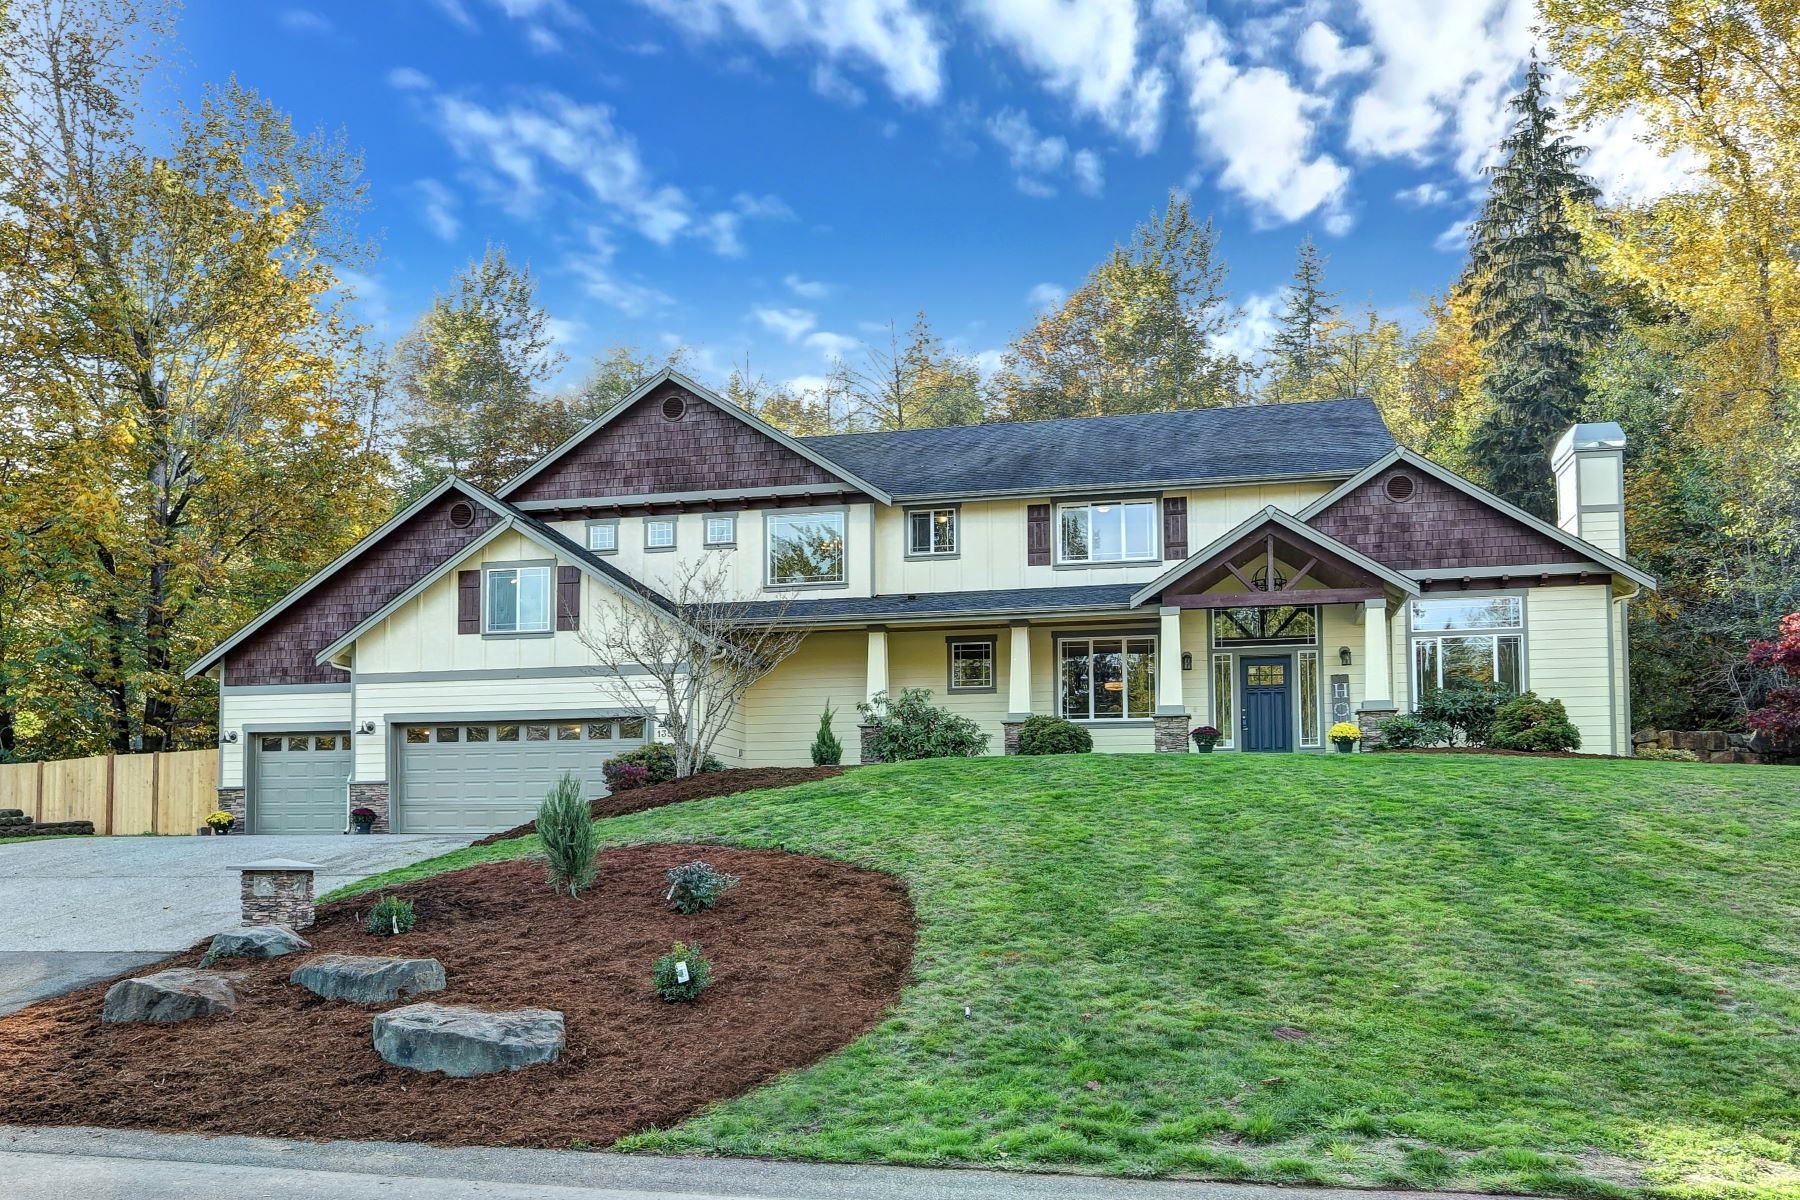 Single Family Homes for Sale at 13514 3rd Ave, Marysville 13514 3rd Ave NE Marysville, Washington 98271 United States